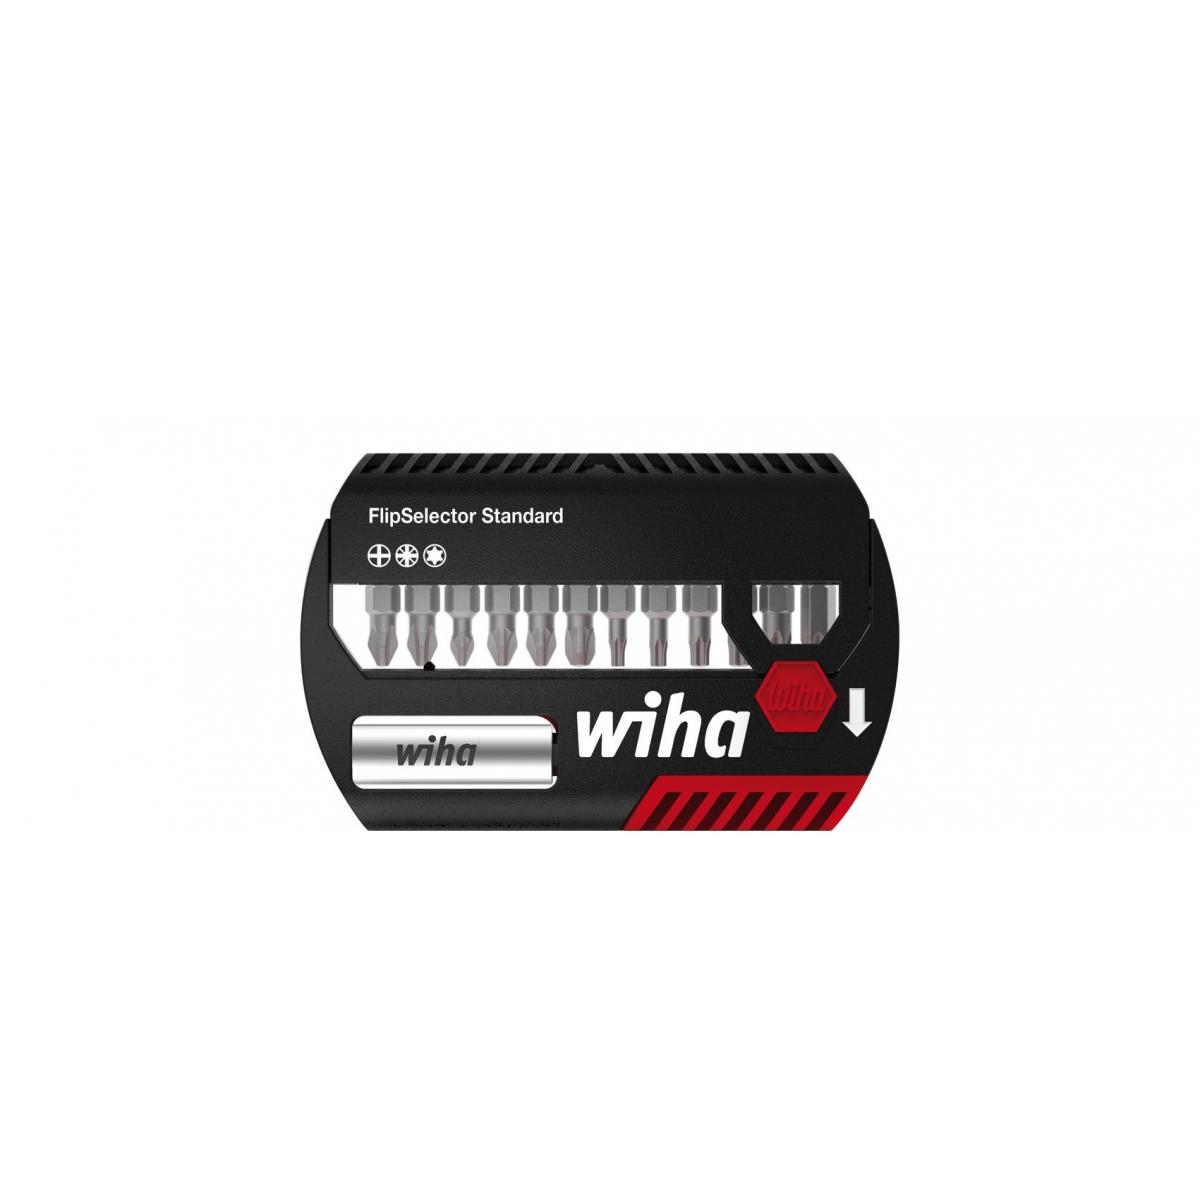 Zestaw bitów FlipSelector Standard 25 mm Wiha - 39060 Zestaw bitów FlipSelector Standard 25 mm Wiha - 39060